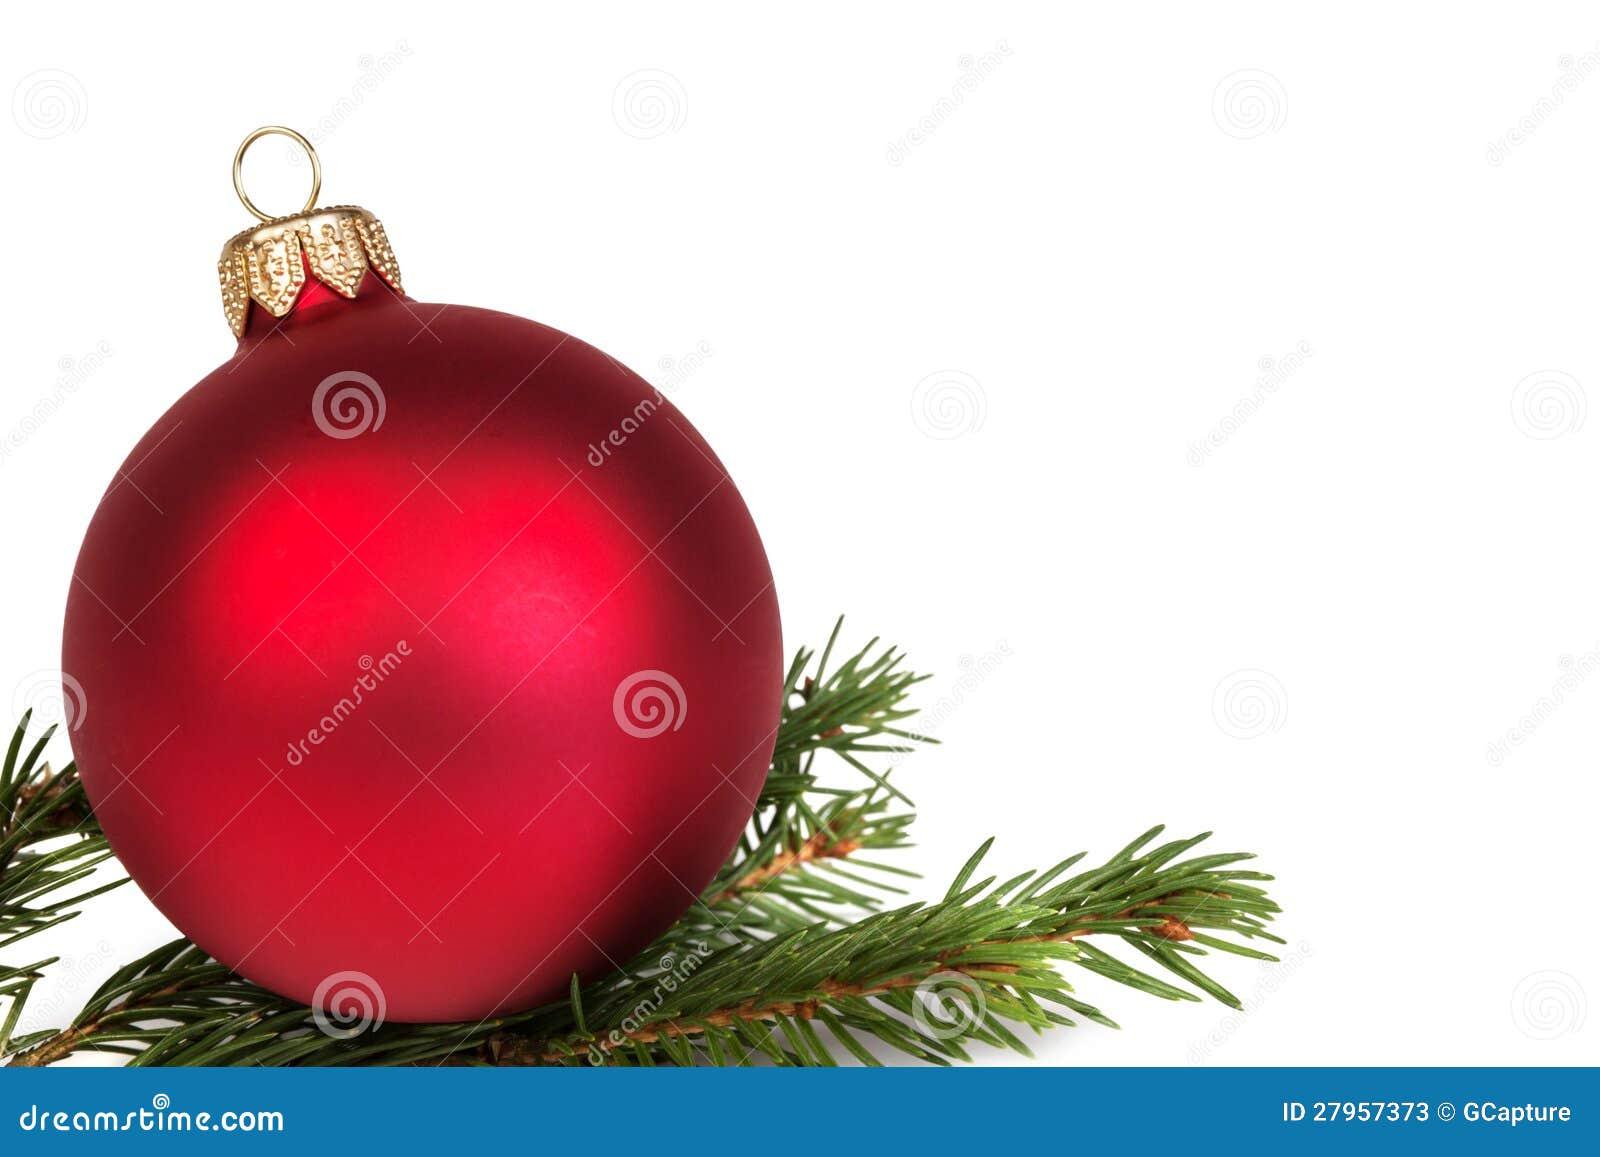 weihnachtskugel auf tannenzweig stock photos 36 images. Black Bedroom Furniture Sets. Home Design Ideas